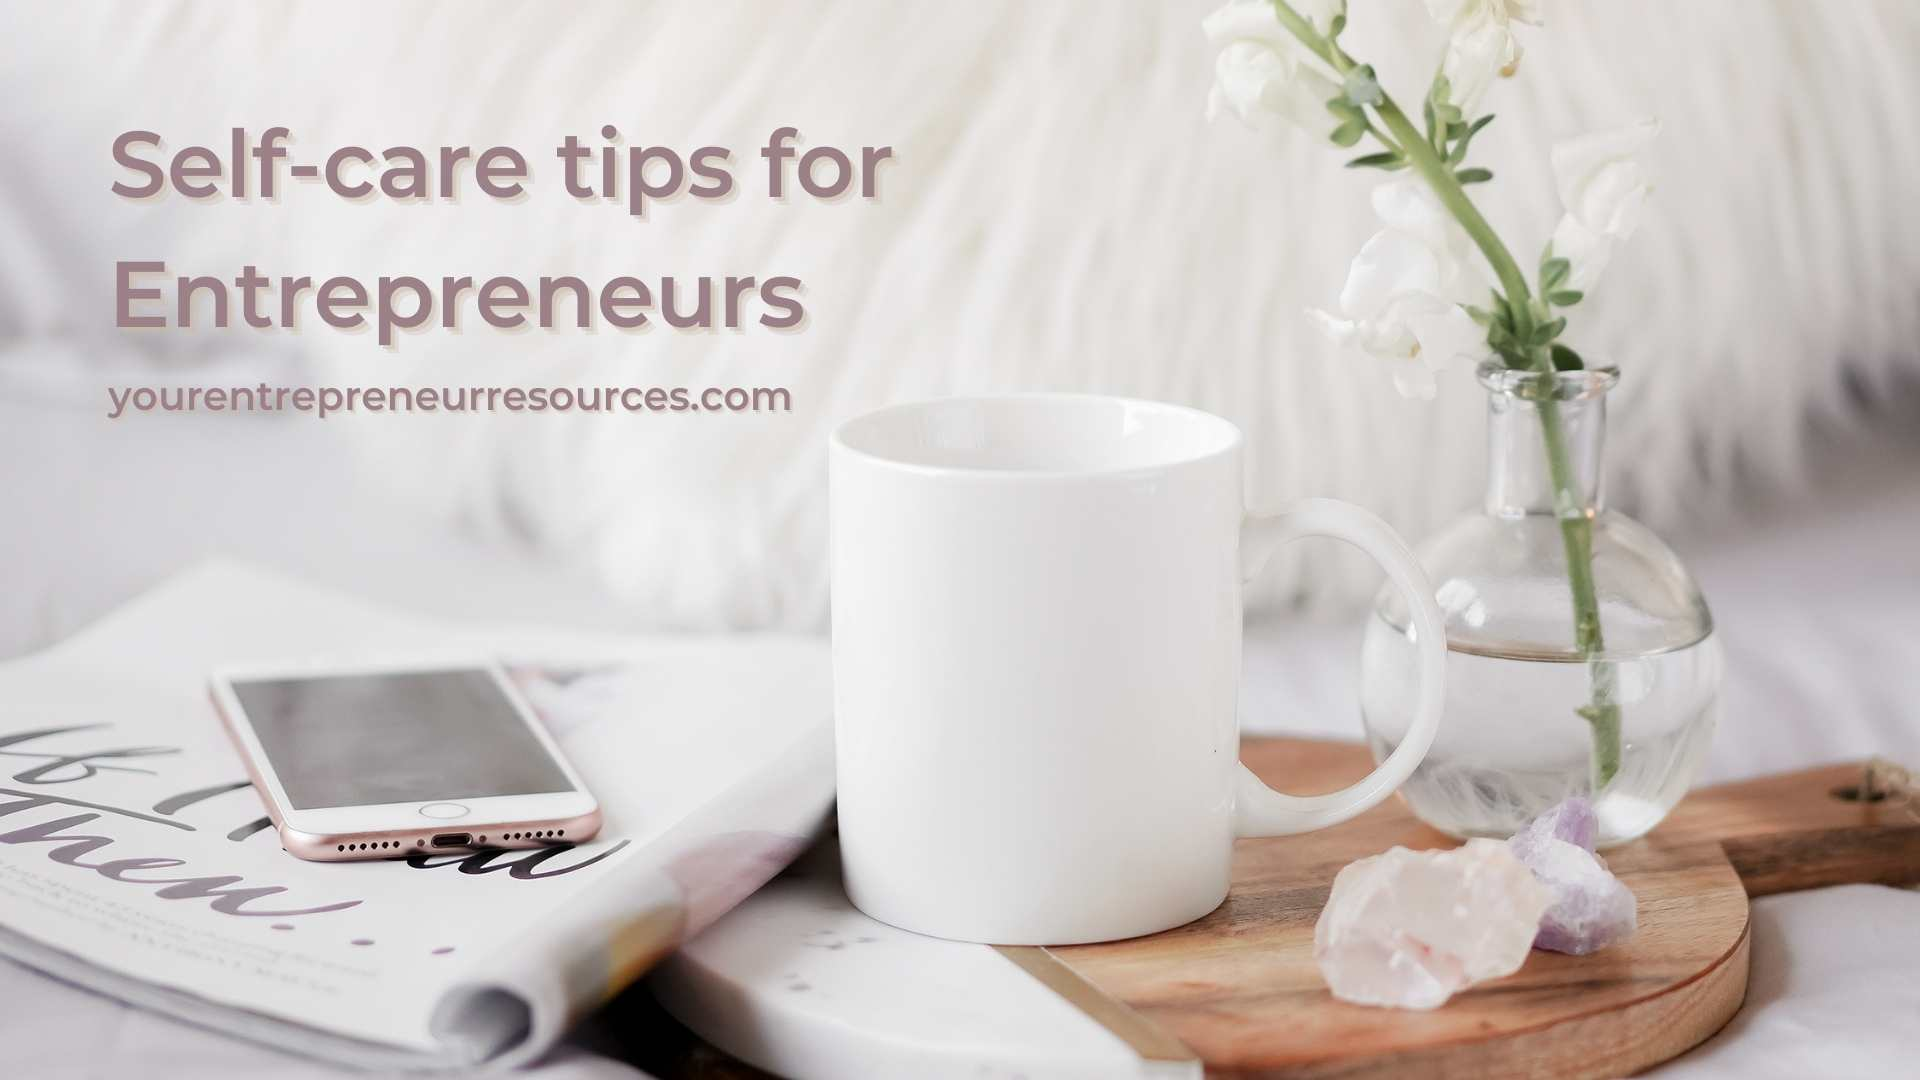 7 important Self-care tips for entrepreneurs to avoid burnout